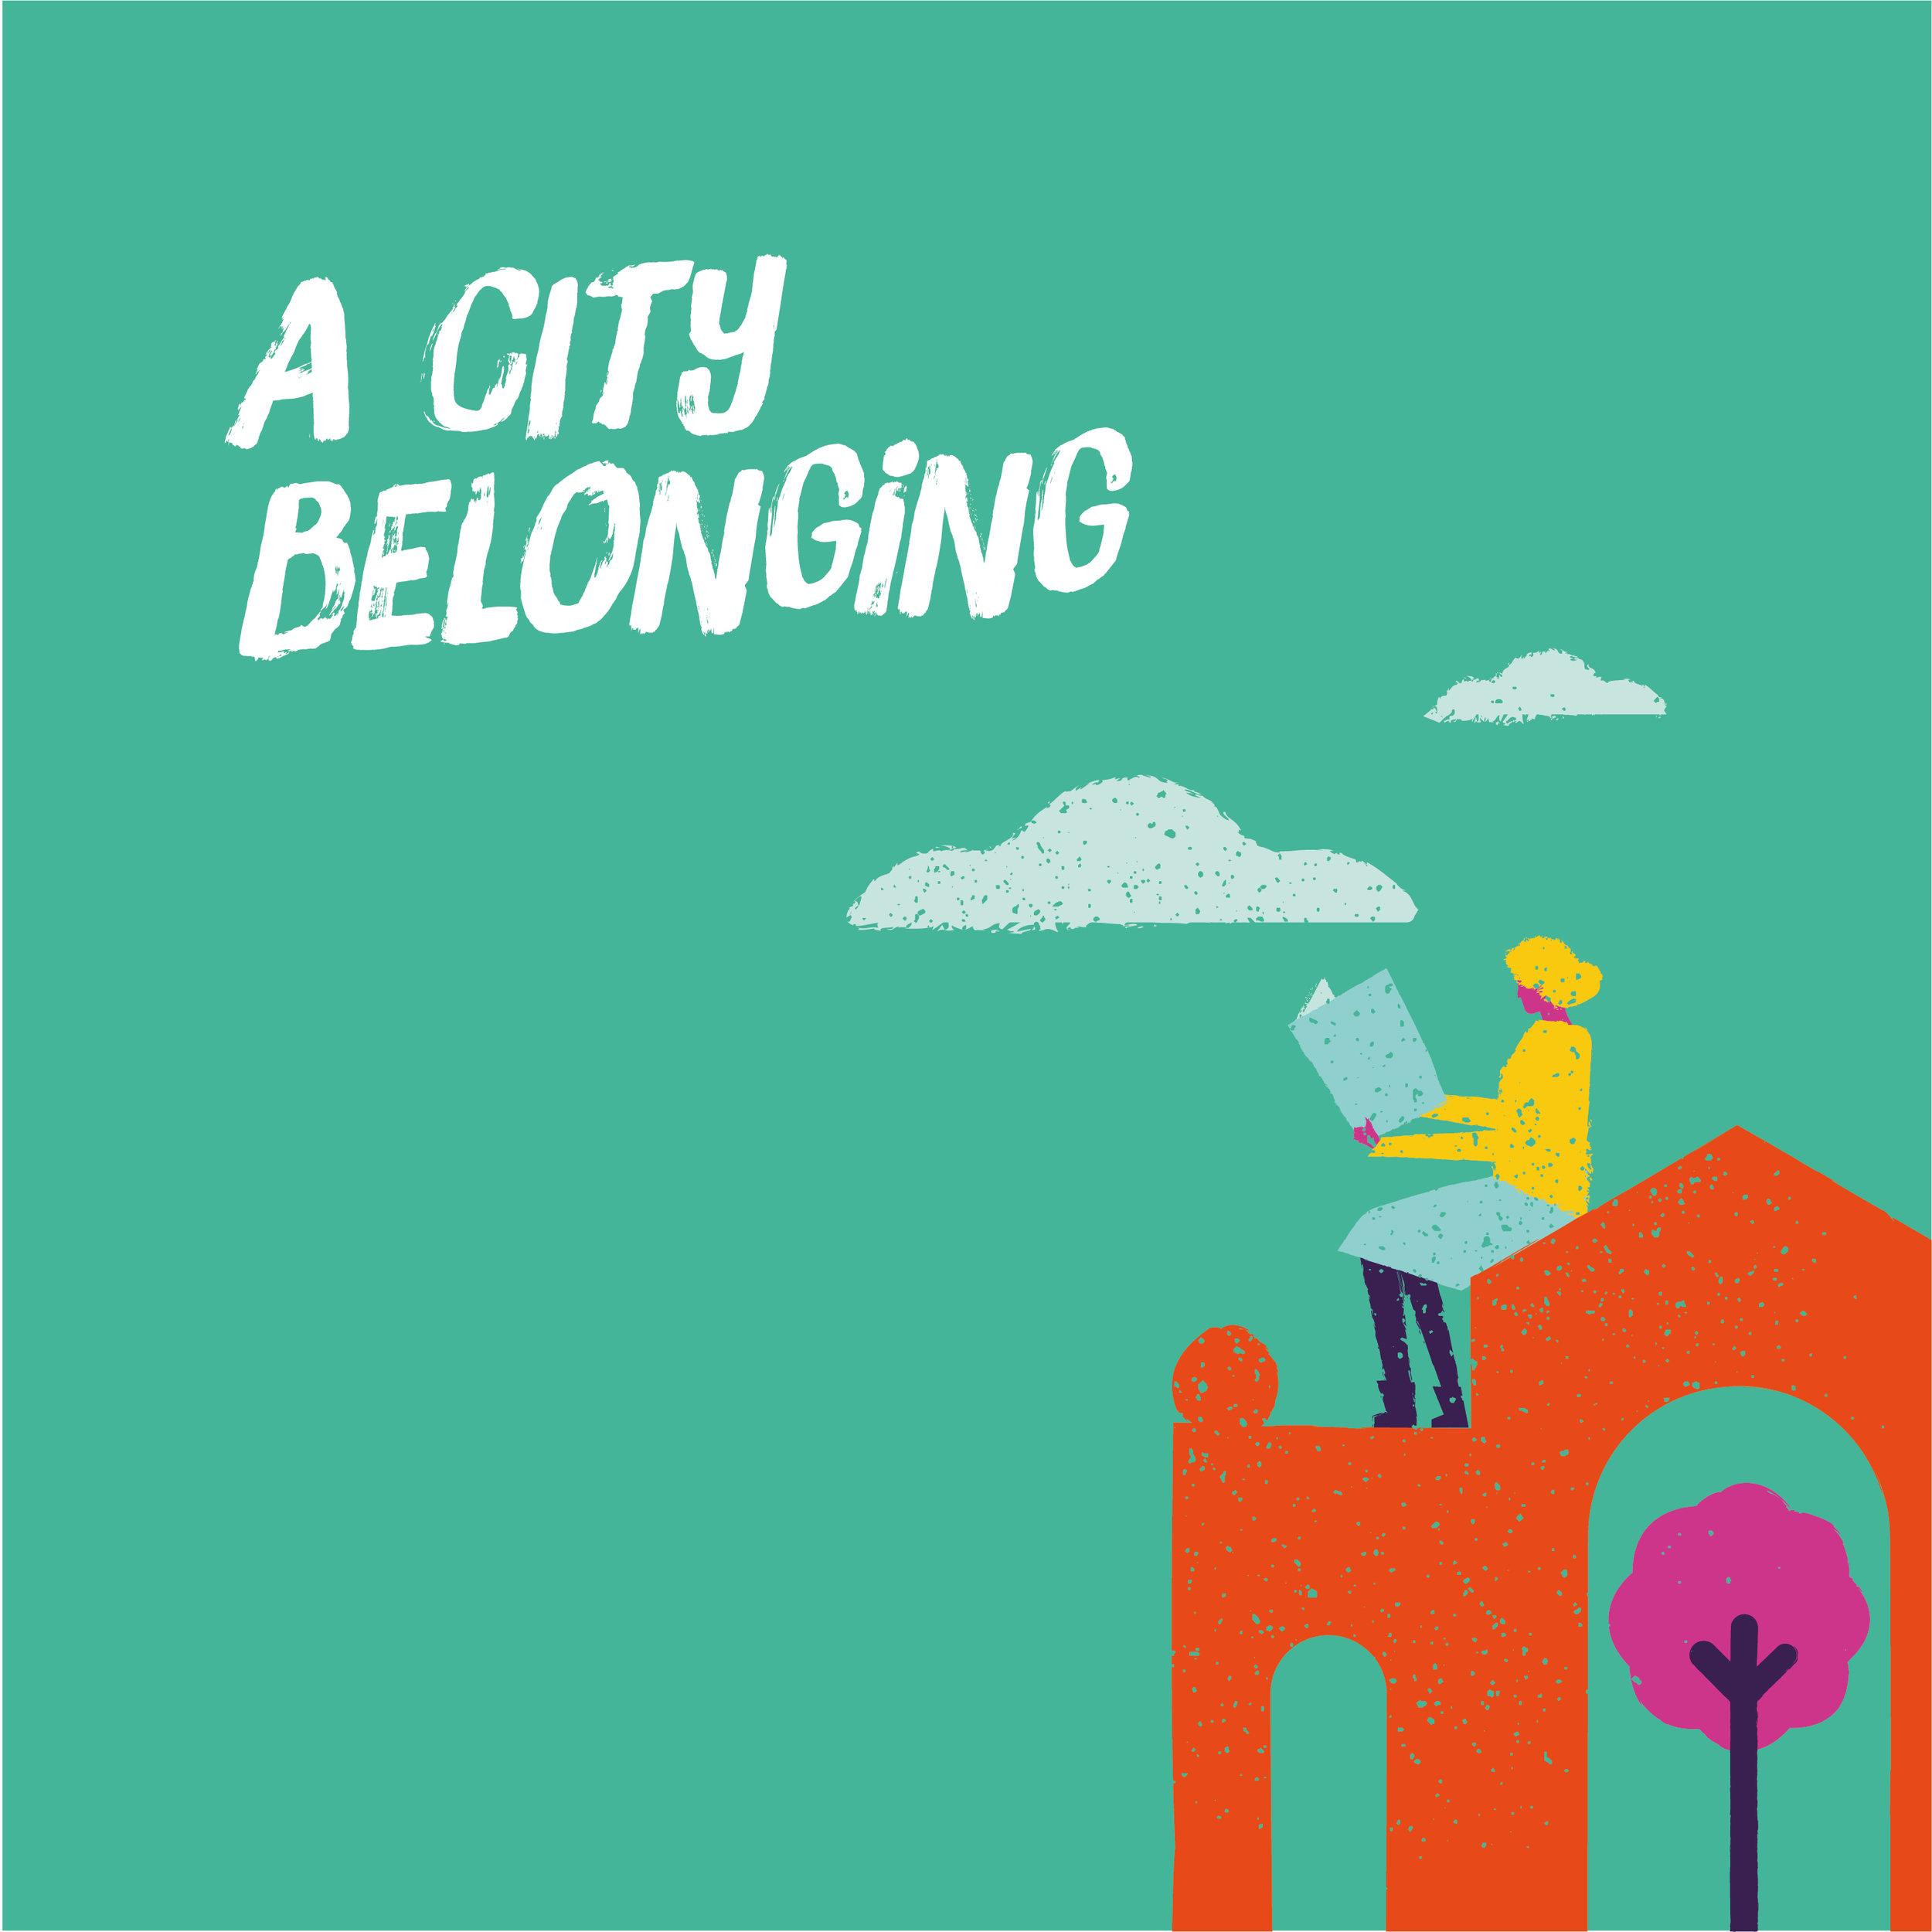 BCC_A CITY IMAGINING12.jpg